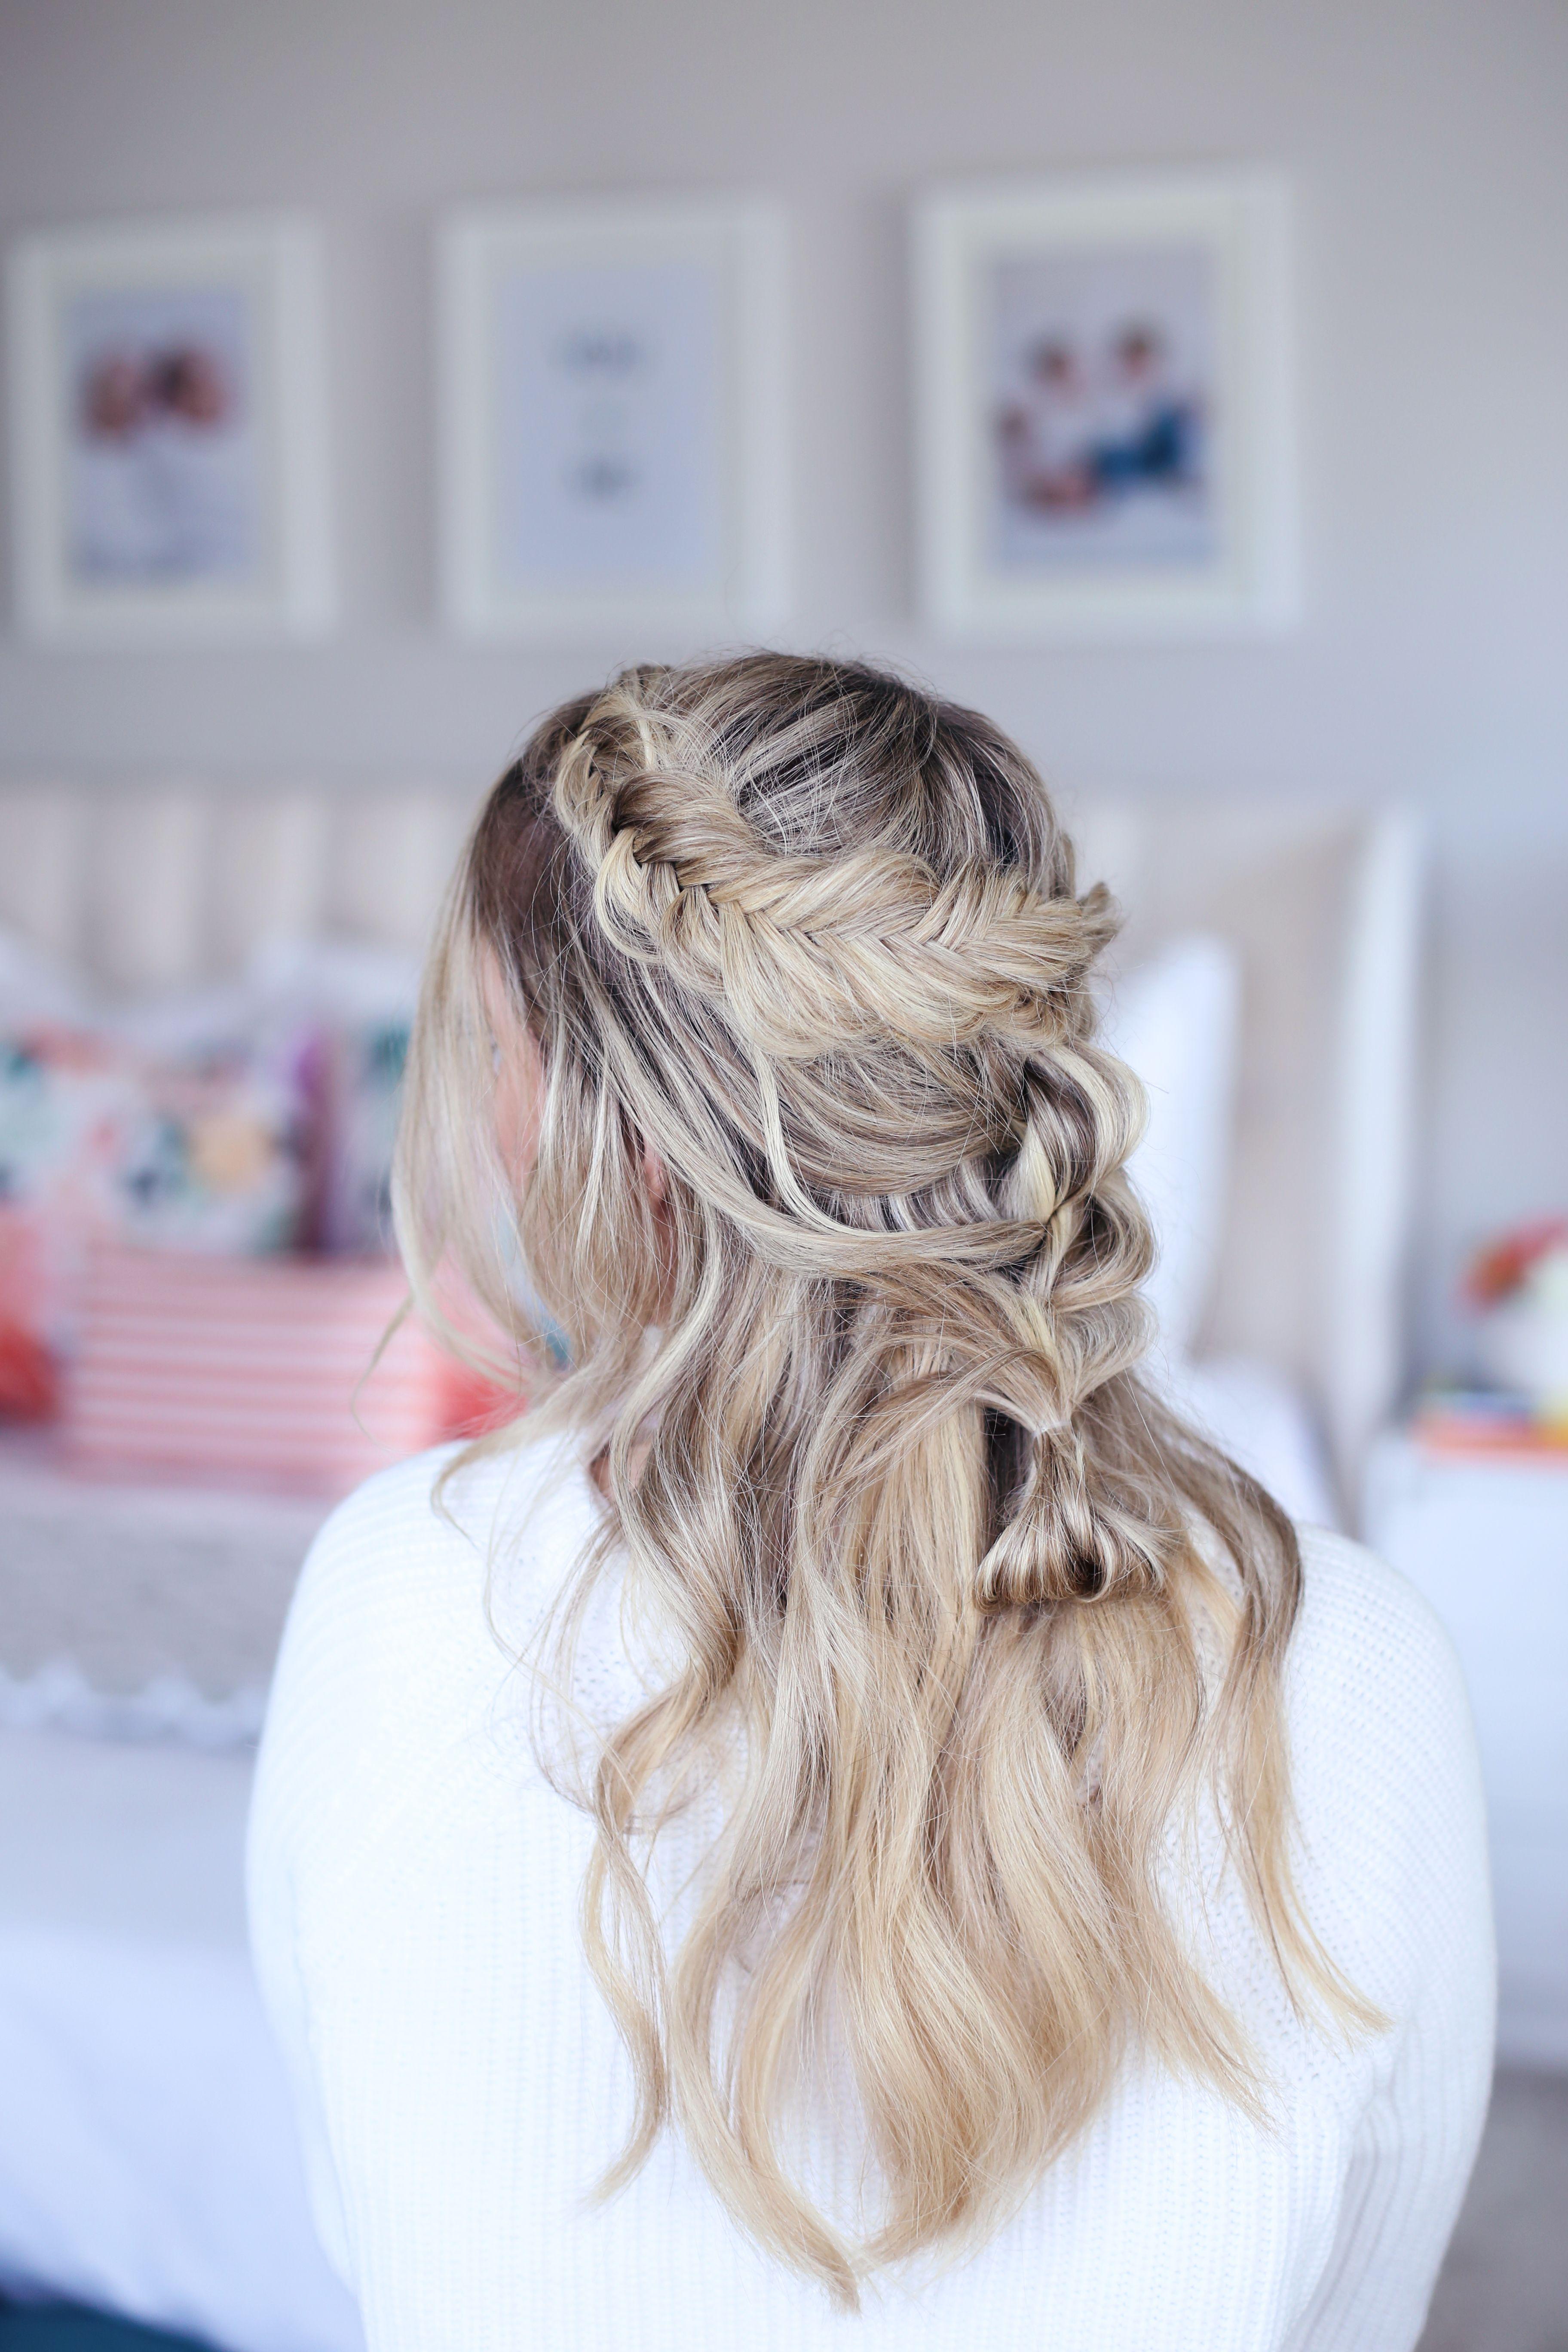 Mixed braid half up hairstyles ideas pinterest hair styles